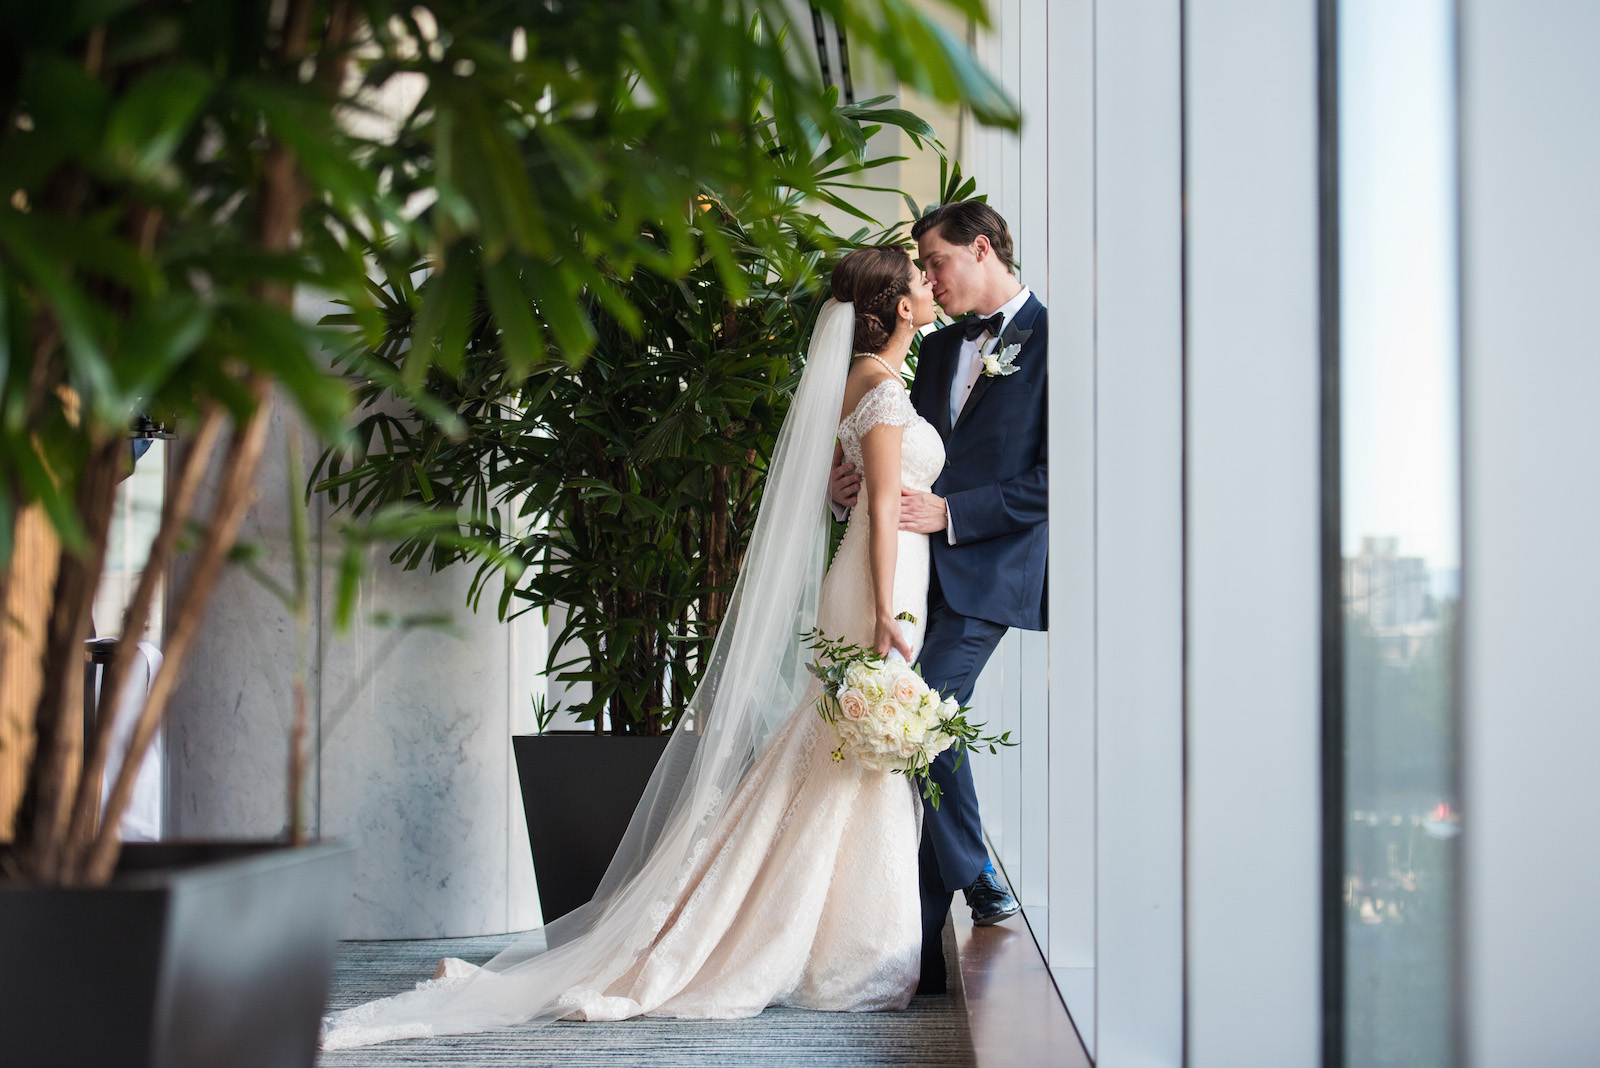 victoria-wedding-photographers-fairmont-pacific-rim-wedding-23.jpg